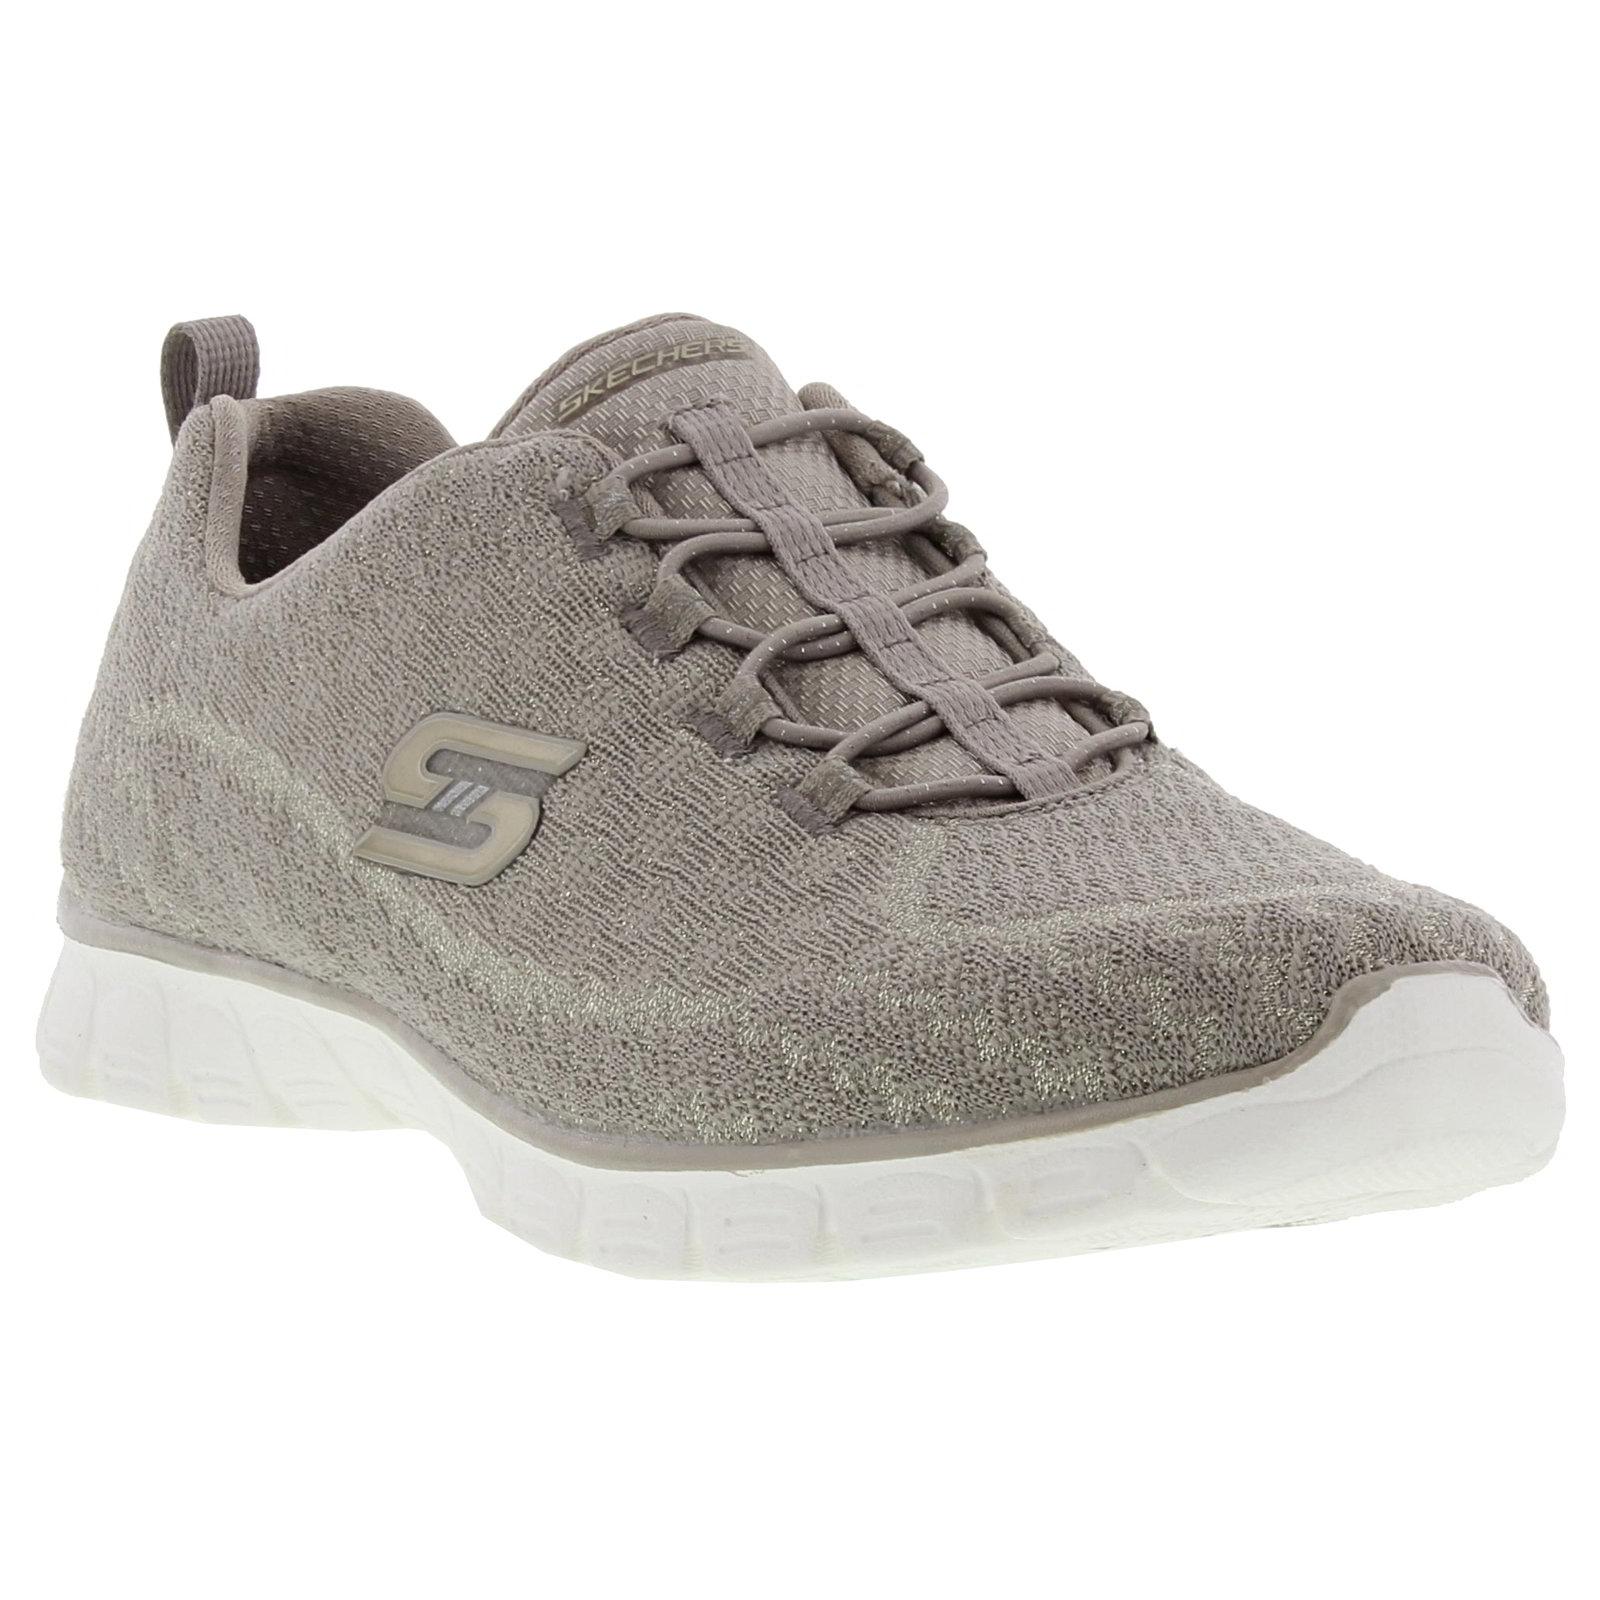 Art Shoes Side Laced Ebay